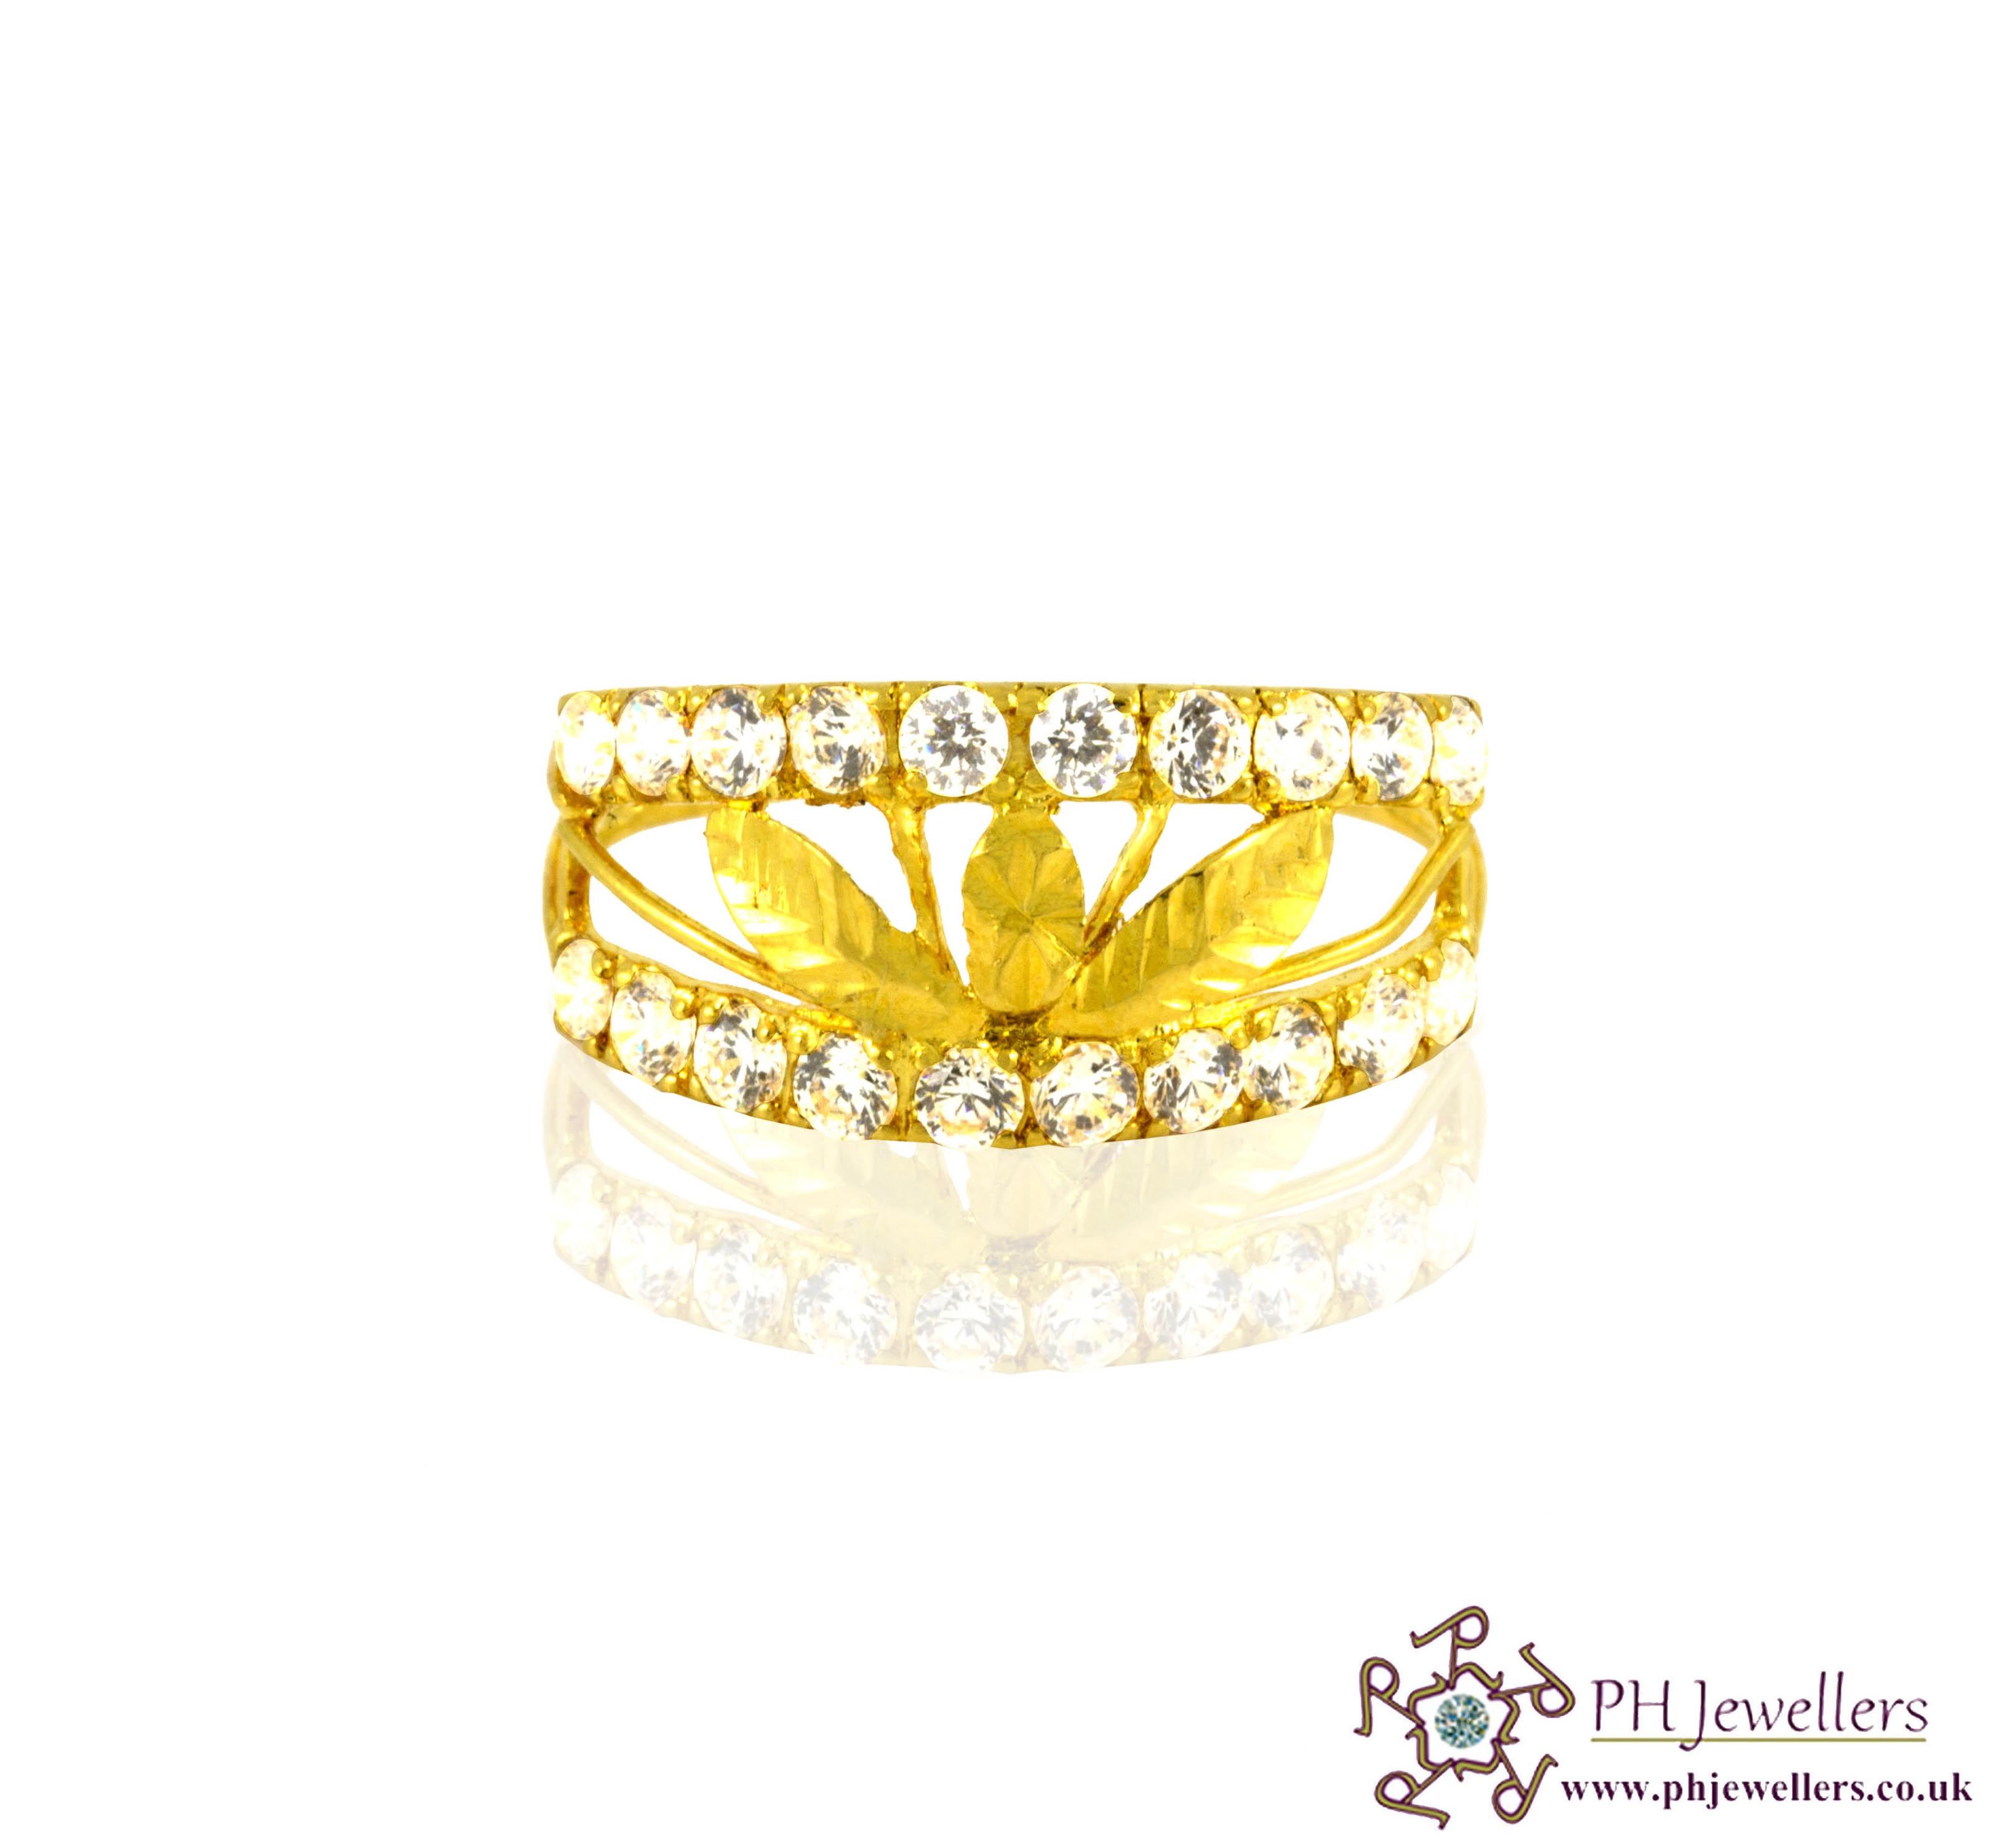 22ct 916 Hallmark Yellow Gold Ring CZ SR4